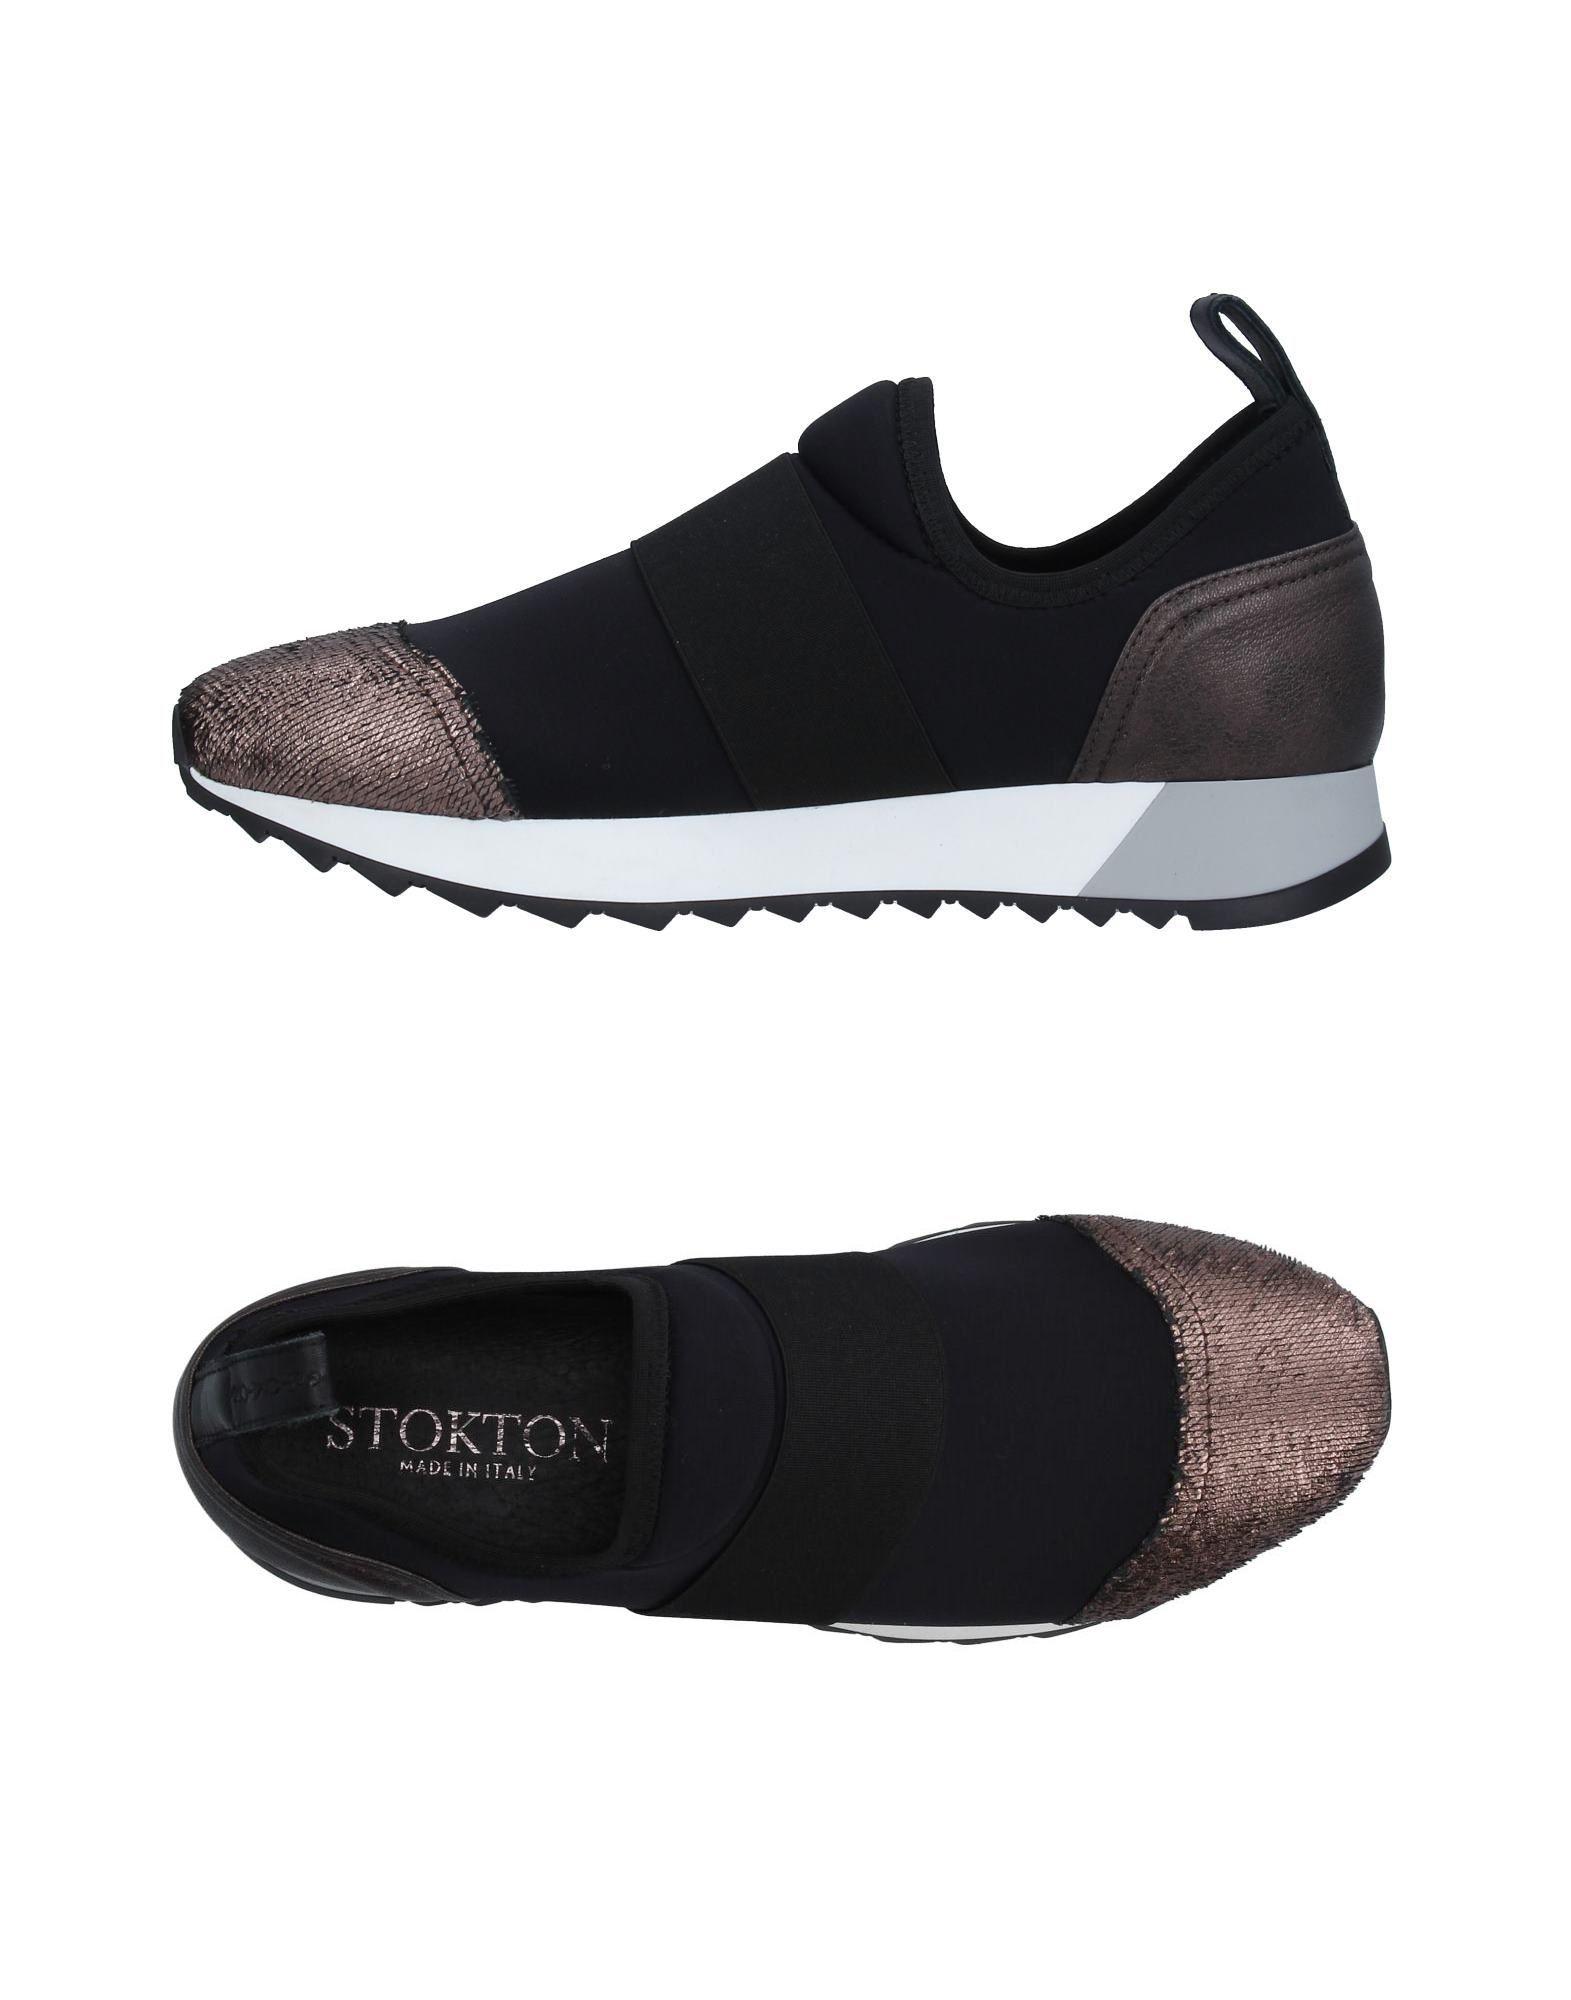 Stokton Sneakers Damen  11259437EB Gute Qualität beliebte Schuhe